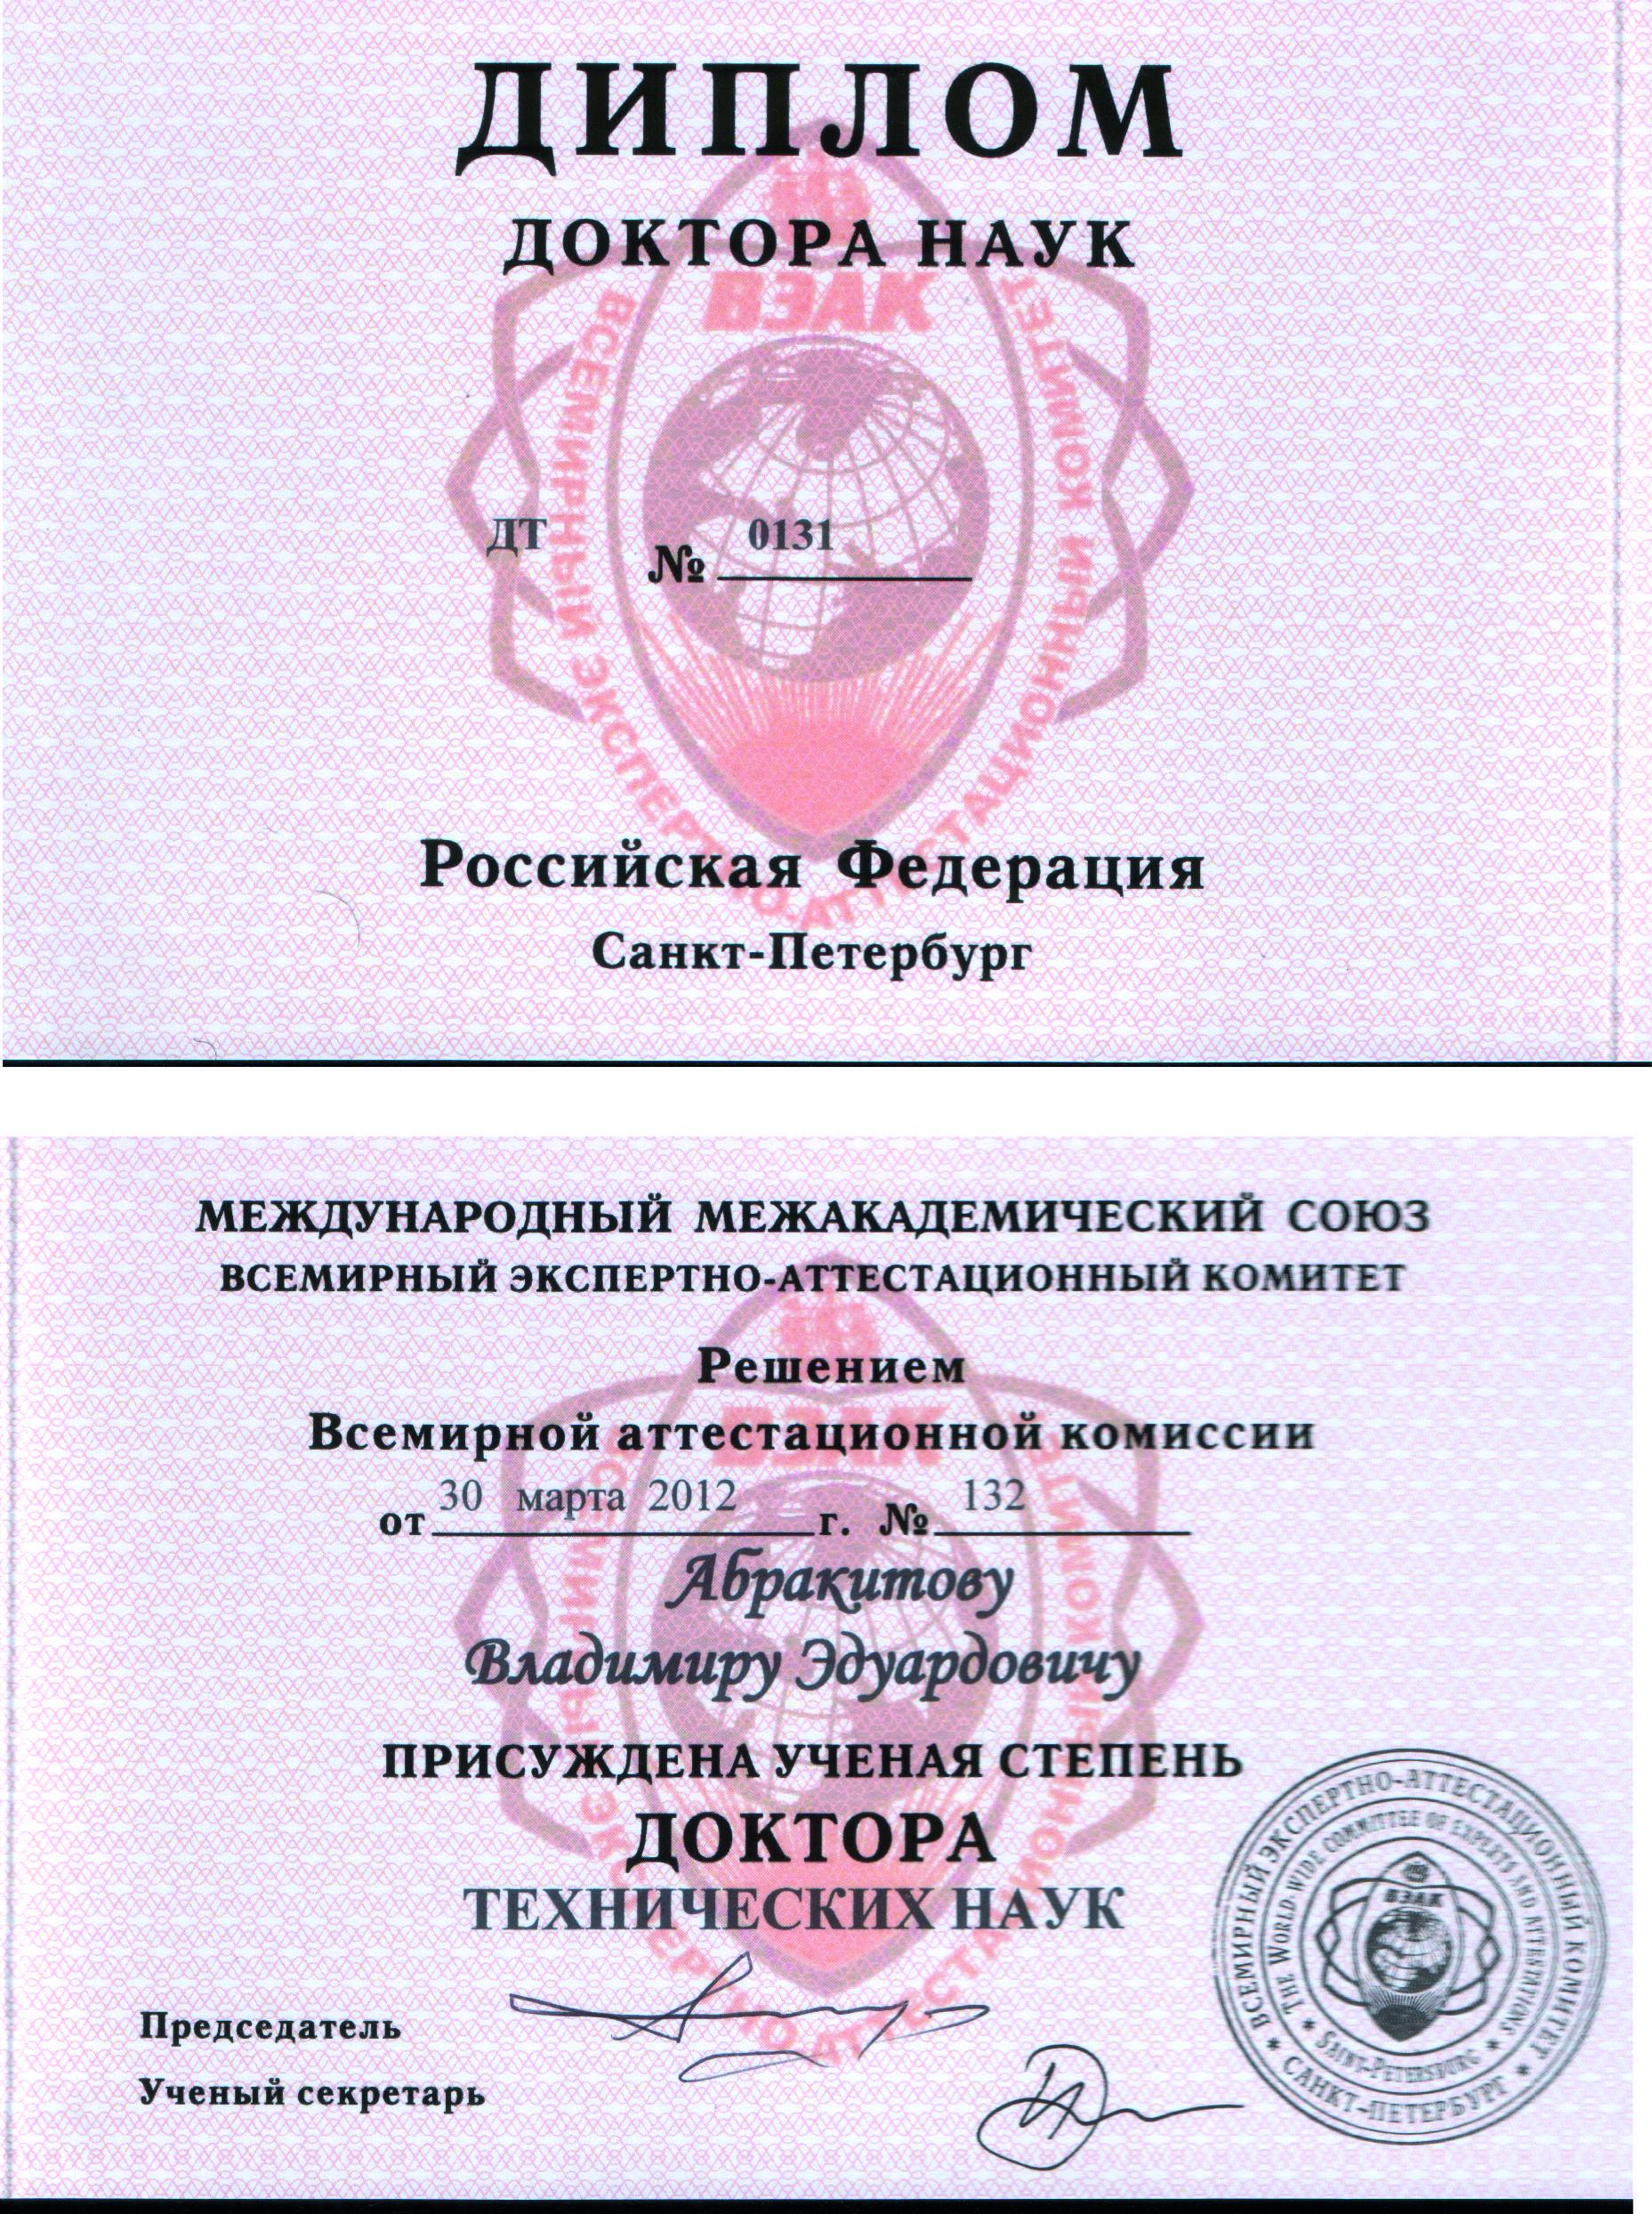 Абракитов Владимир Эдуардович кандидат технических наук доктор технических наук 2012